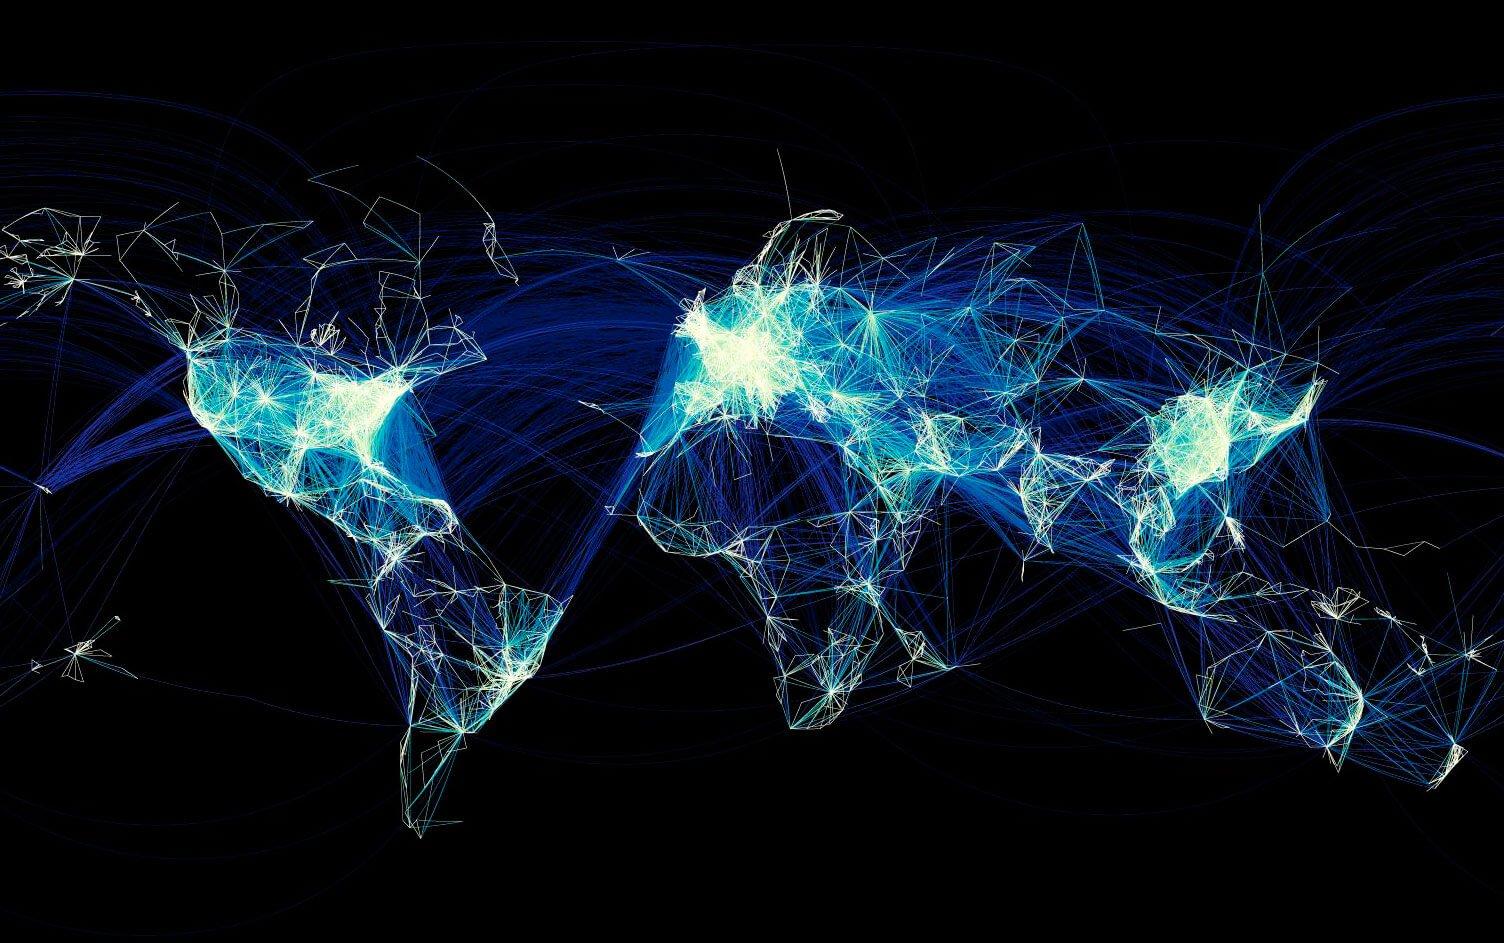 Global-Nodes-Network-1.jpg